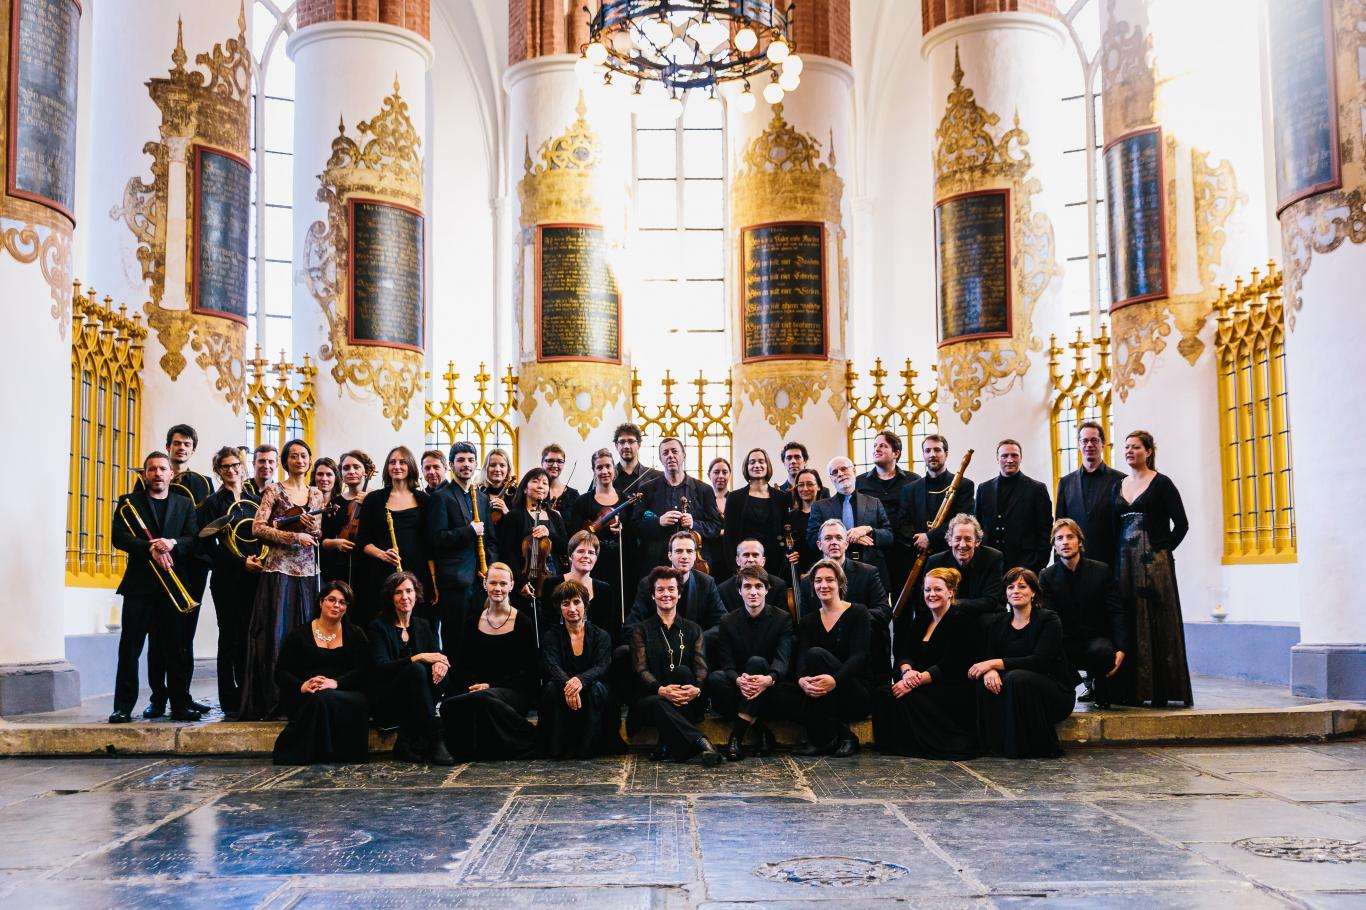 Alexander's Feast - Georg Friedrich Händel - Luthers Bach Ensemble